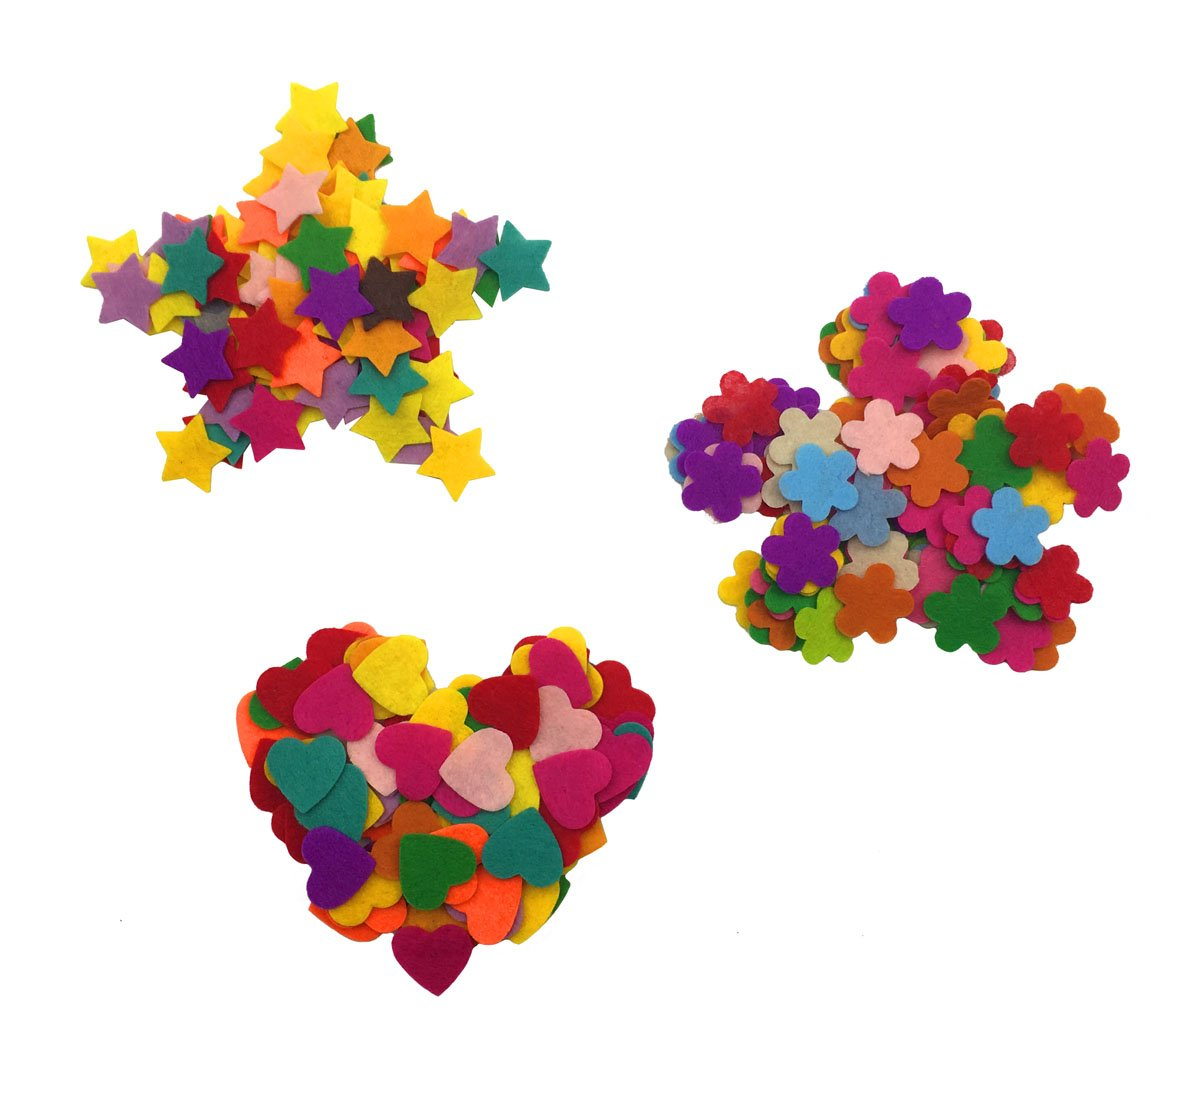 Hyamass Approx 300pcs Multi Color Mini Felt Flower Heart Star Embellishments DIY Craft Decoration